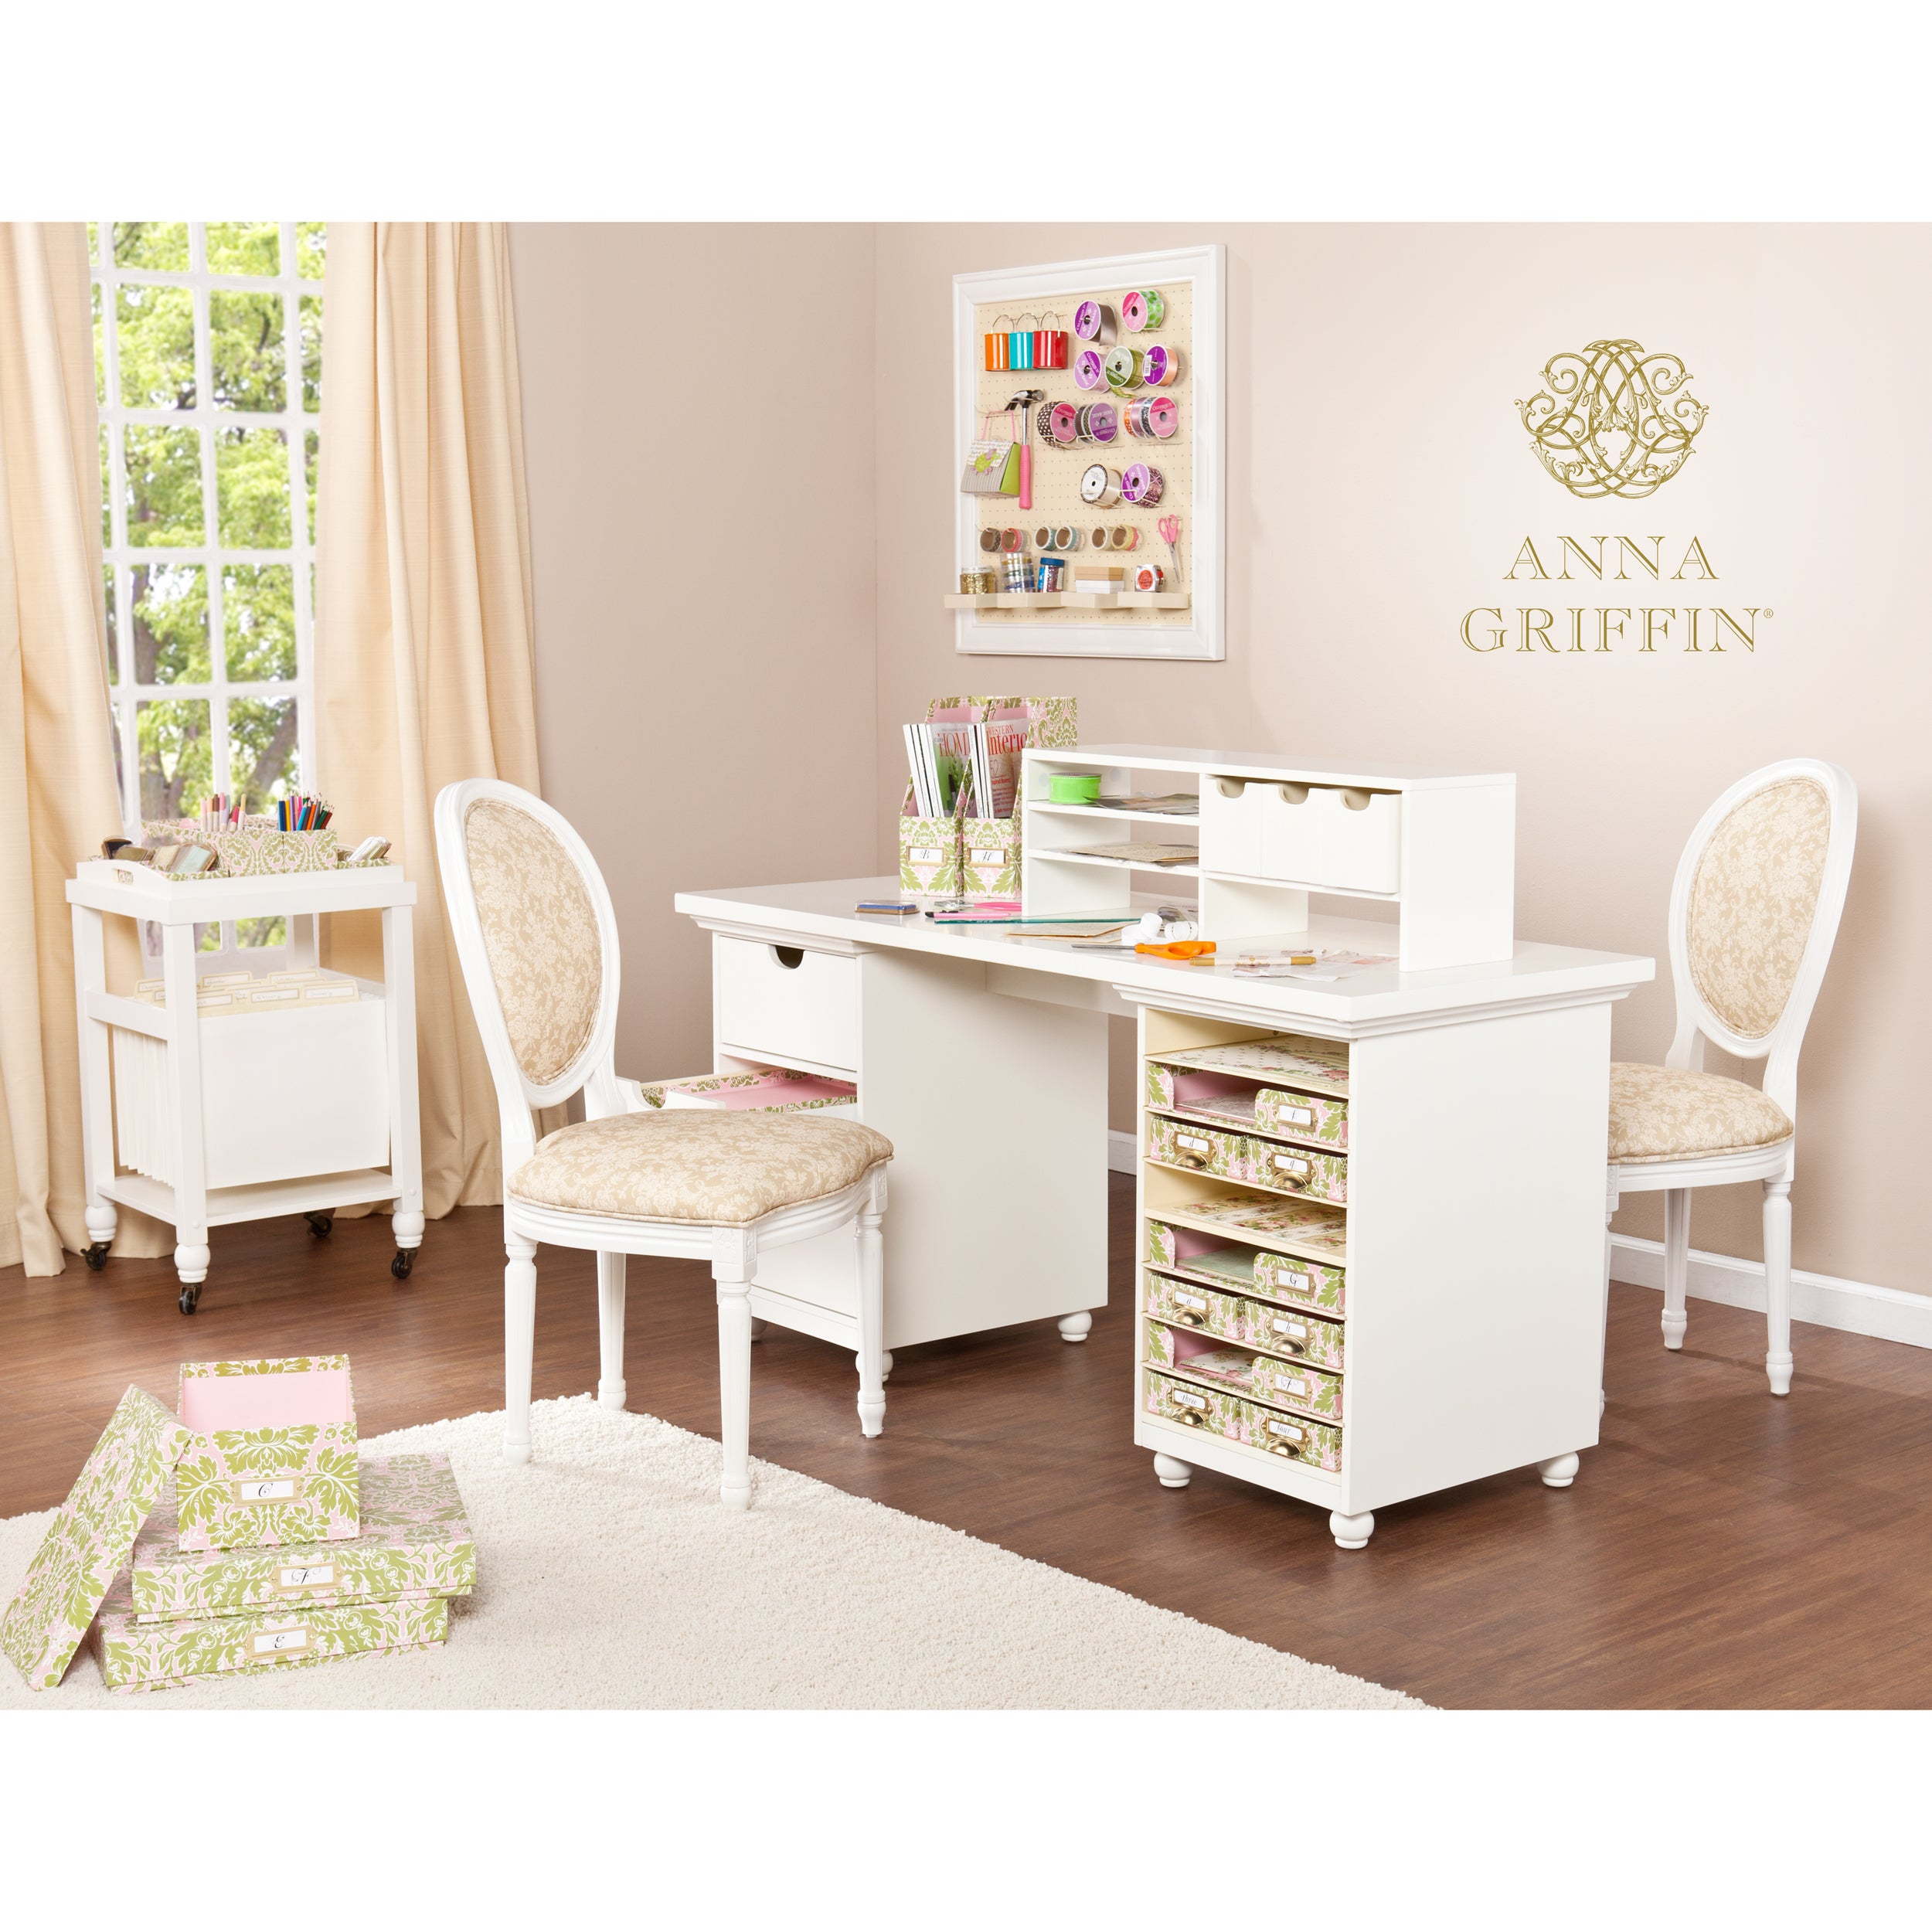 Anna Griffin Craft Room Desktop Organizer Free Shipping Today 11740644